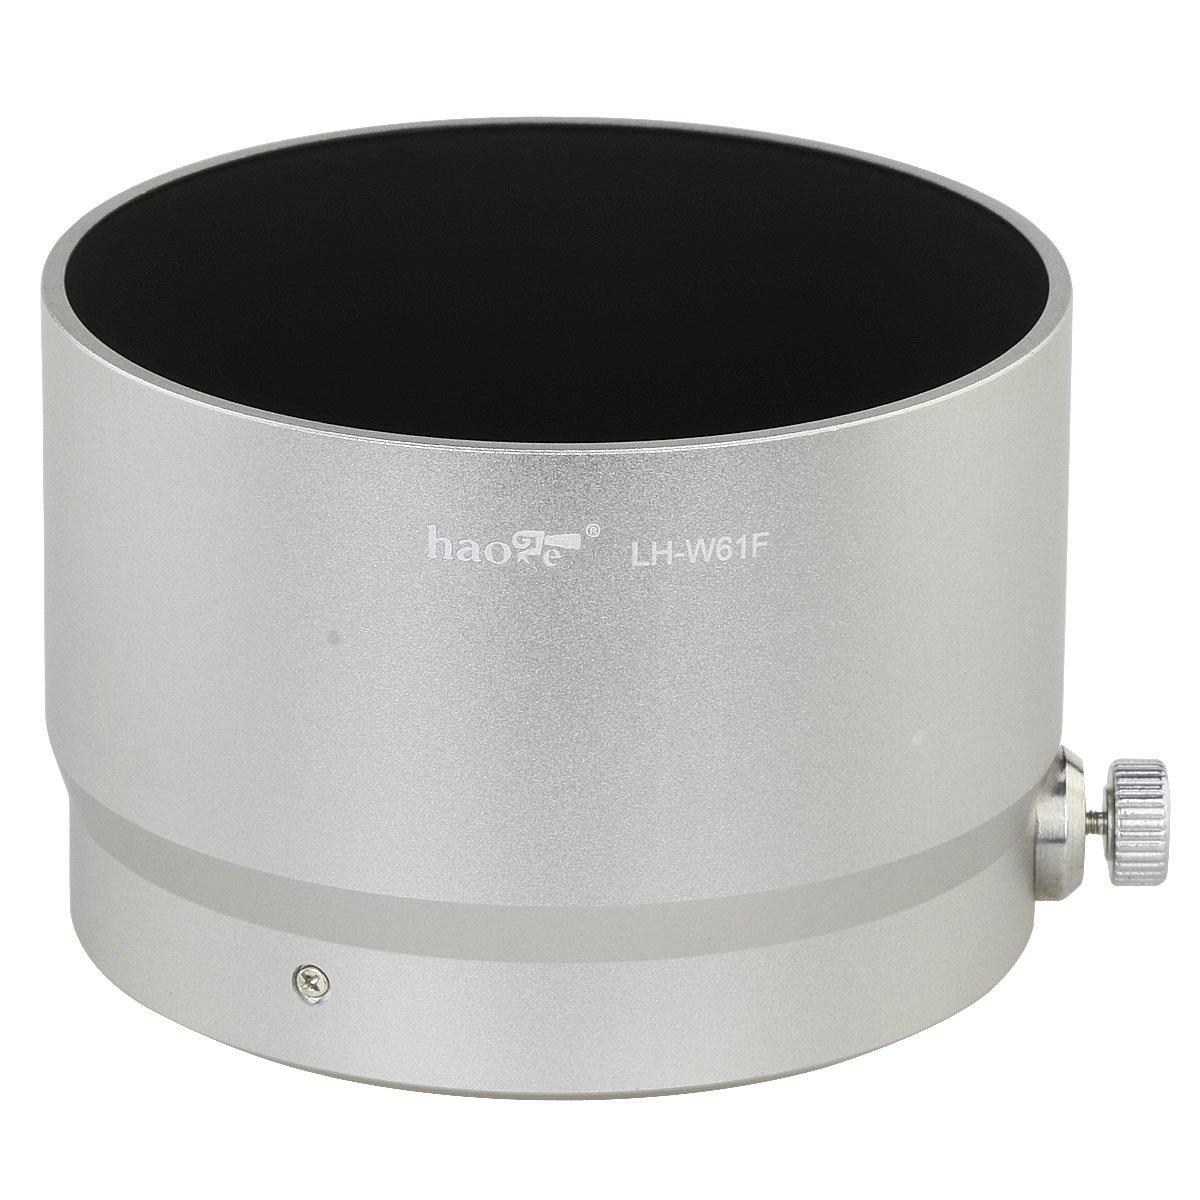 Haoge LH-W61F Metal Lens Hood Shade for Olympus M.ZUIKO Digital ED 75mm F1.8 Lens Replaces Olympus LH-61F Silver